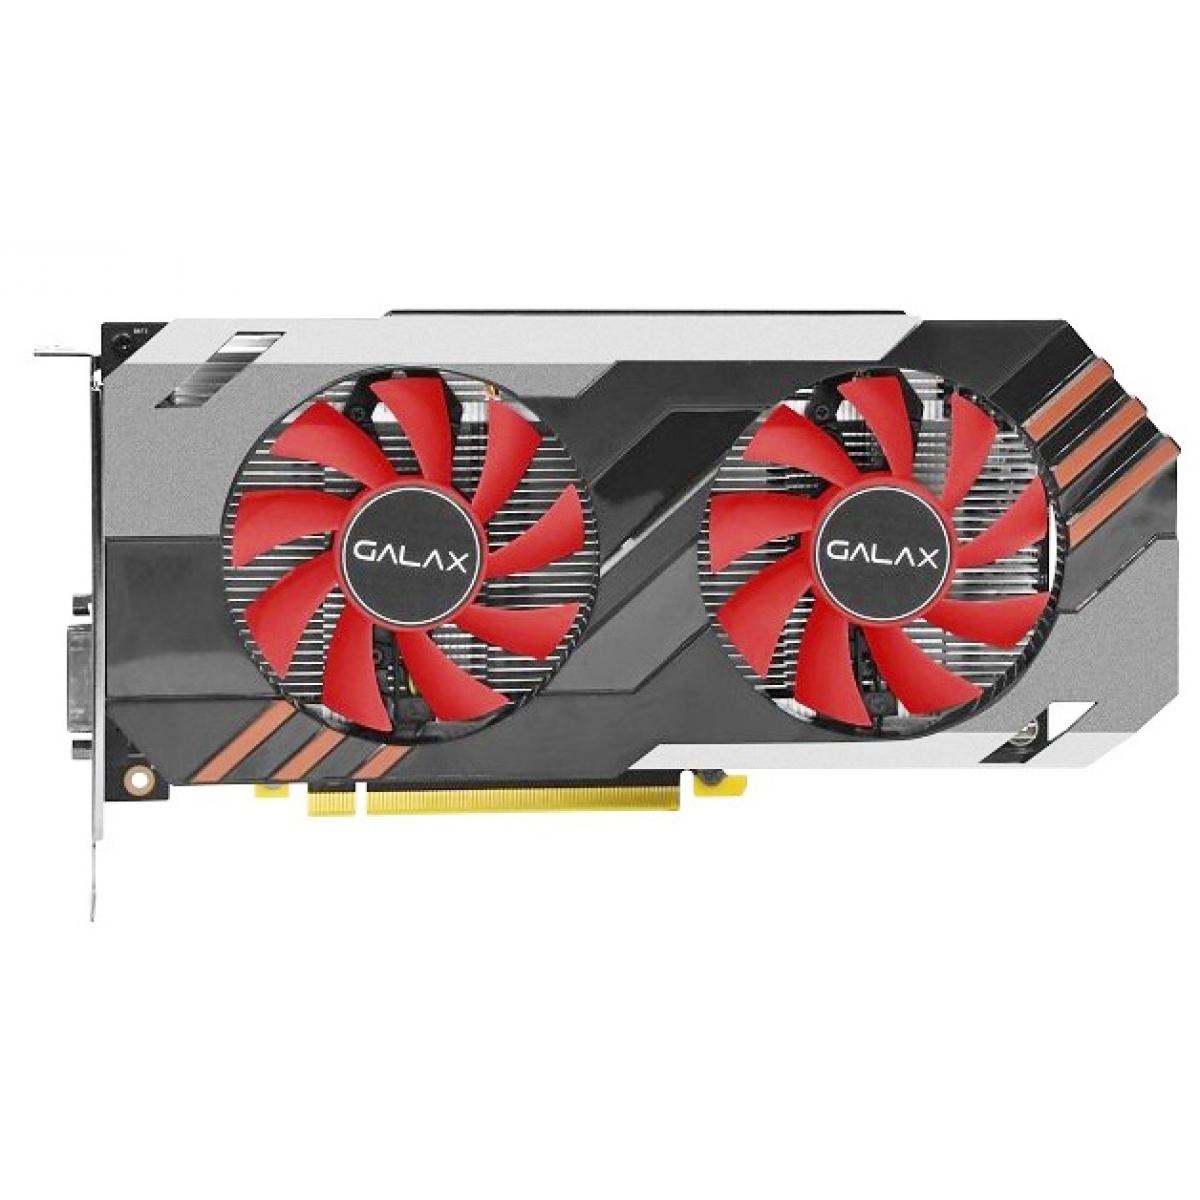 Placa de Vídeo Galax GeForce GTX 1060 OC Dual, 6GB GDDR5, 192Bit, 60NRH7DSN5E6